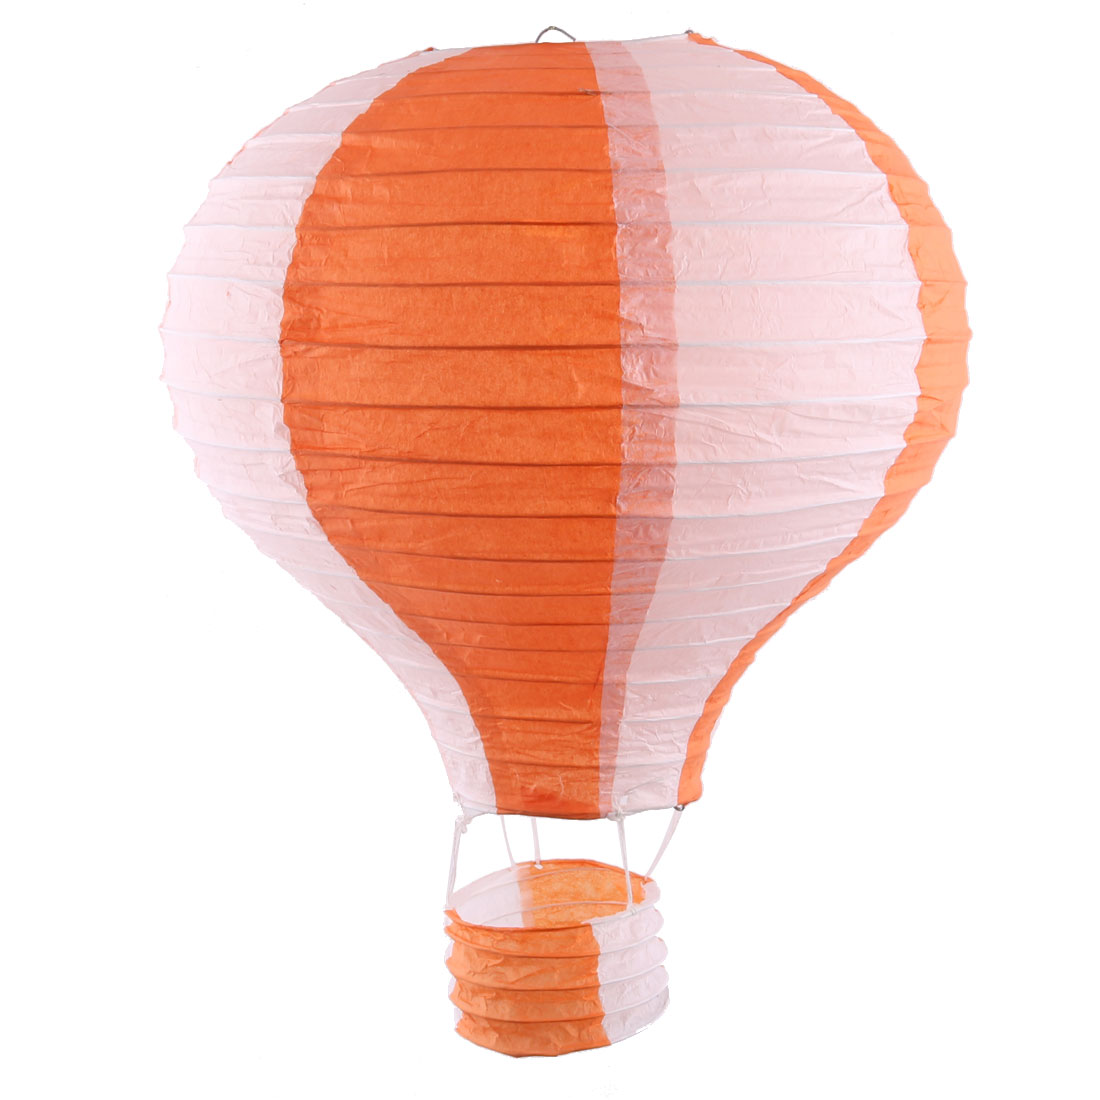 Engagement Festival Party Paper DIY Handmade Lightless Hanging Hot Air Balloon Lantern Orange White